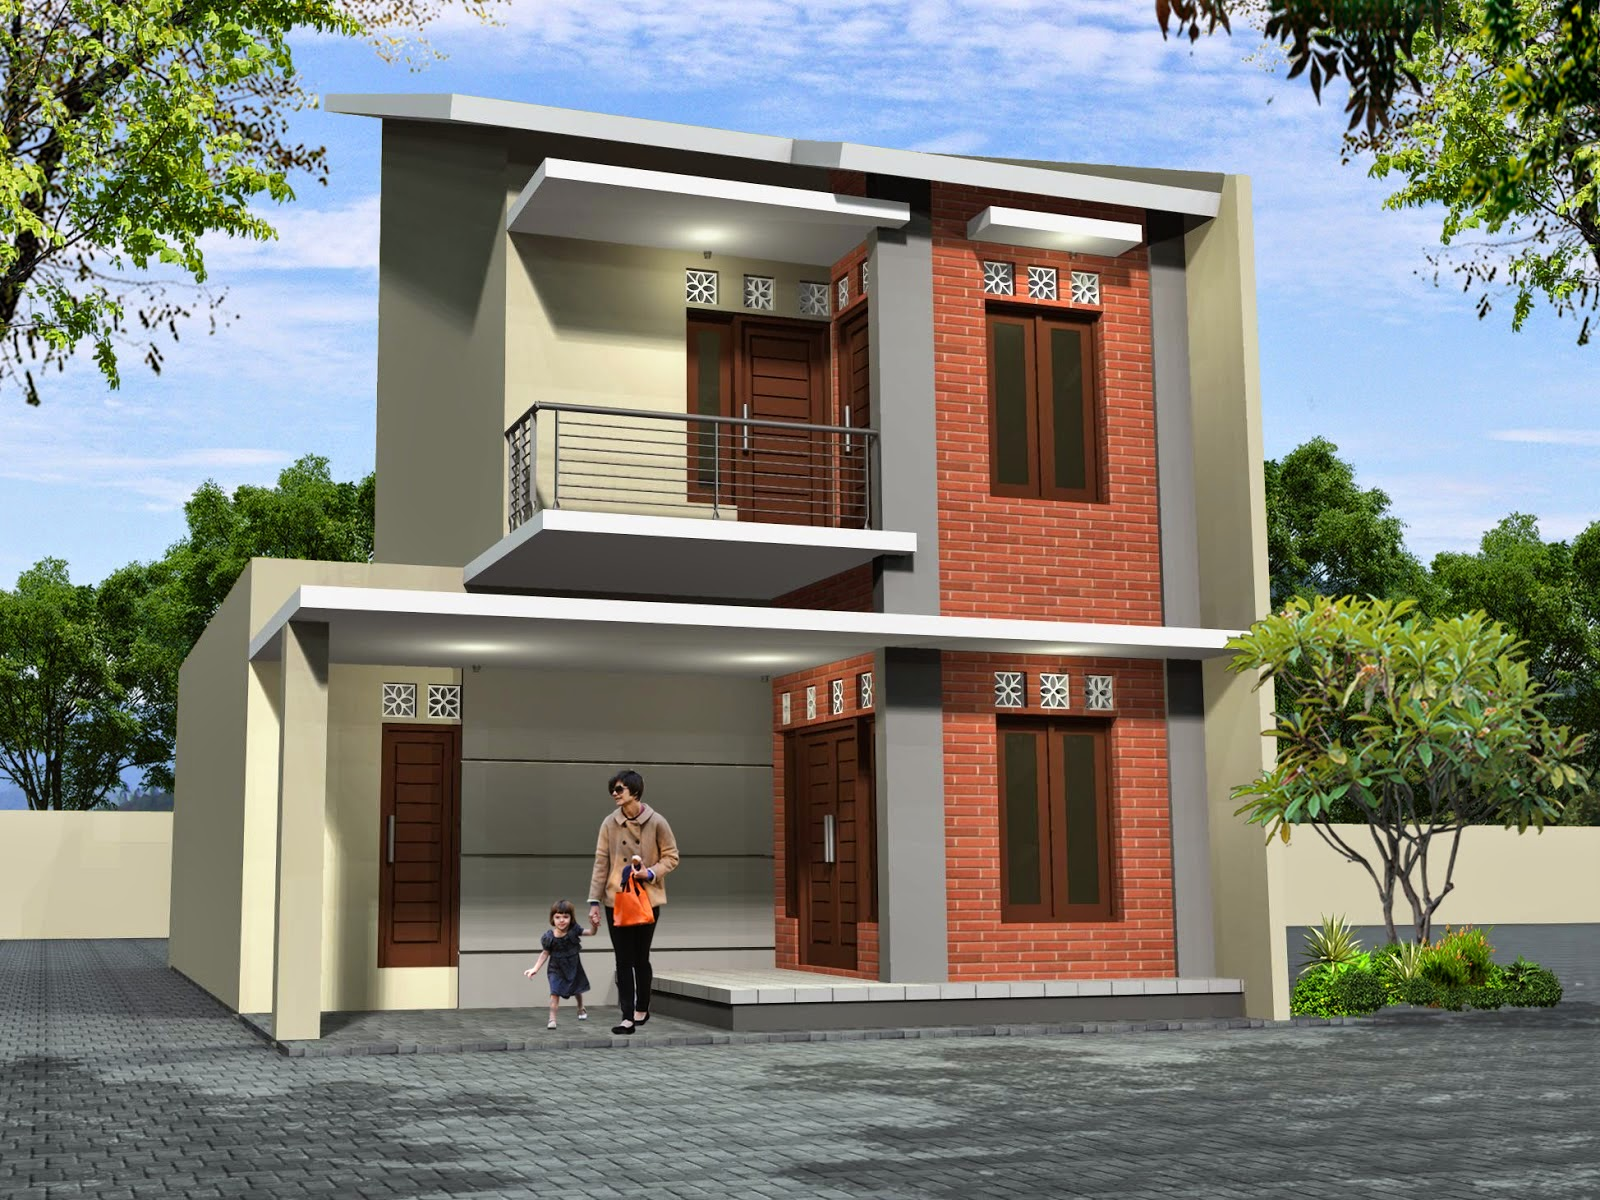 Gambar Rumah Idaman Sederhana 2 Lantai